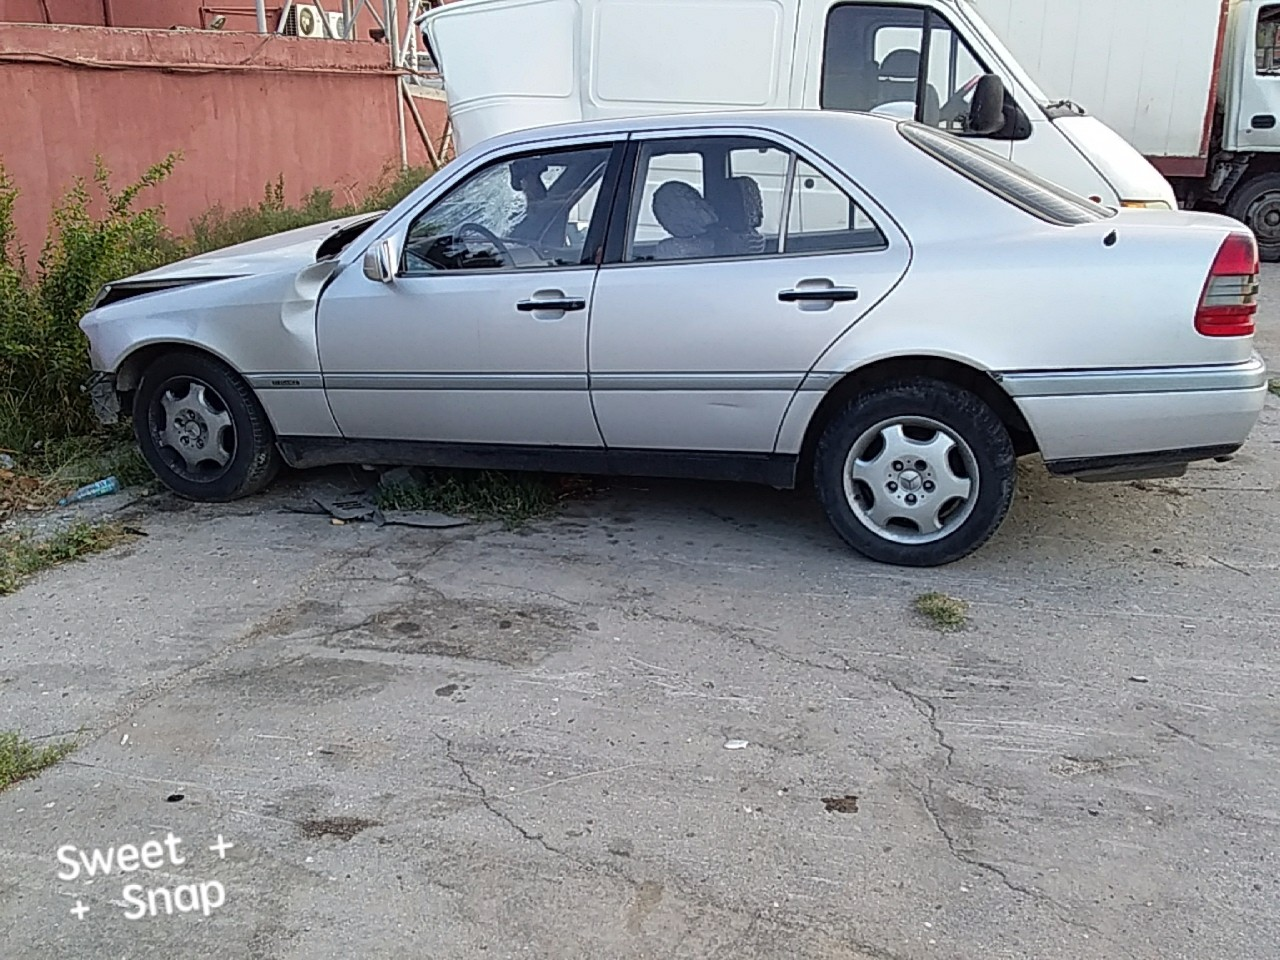 Mercedes-Benz C 180 1.8(lt) 1995 İkinci əl  $2200